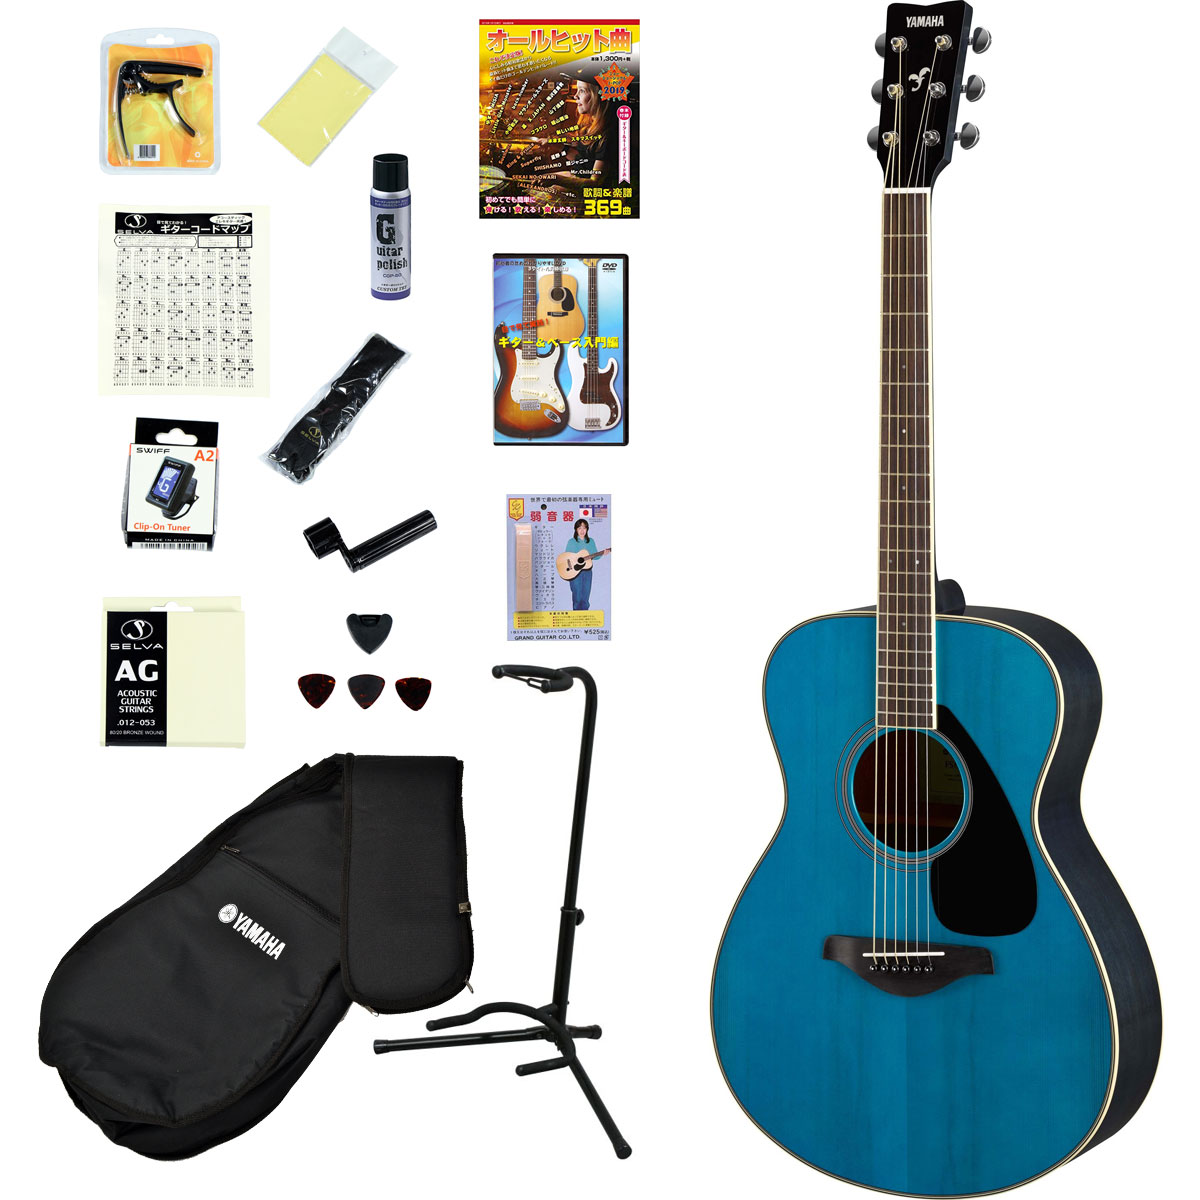 YAMAHA / FS820 TQ(ターコイズ) 【オールヒット曲歌本17点入門セット】【楽譜が付いたお買い得セット】 ヤマハ アコースティックギター アコギ FS-820 入門 初心者【YRK】